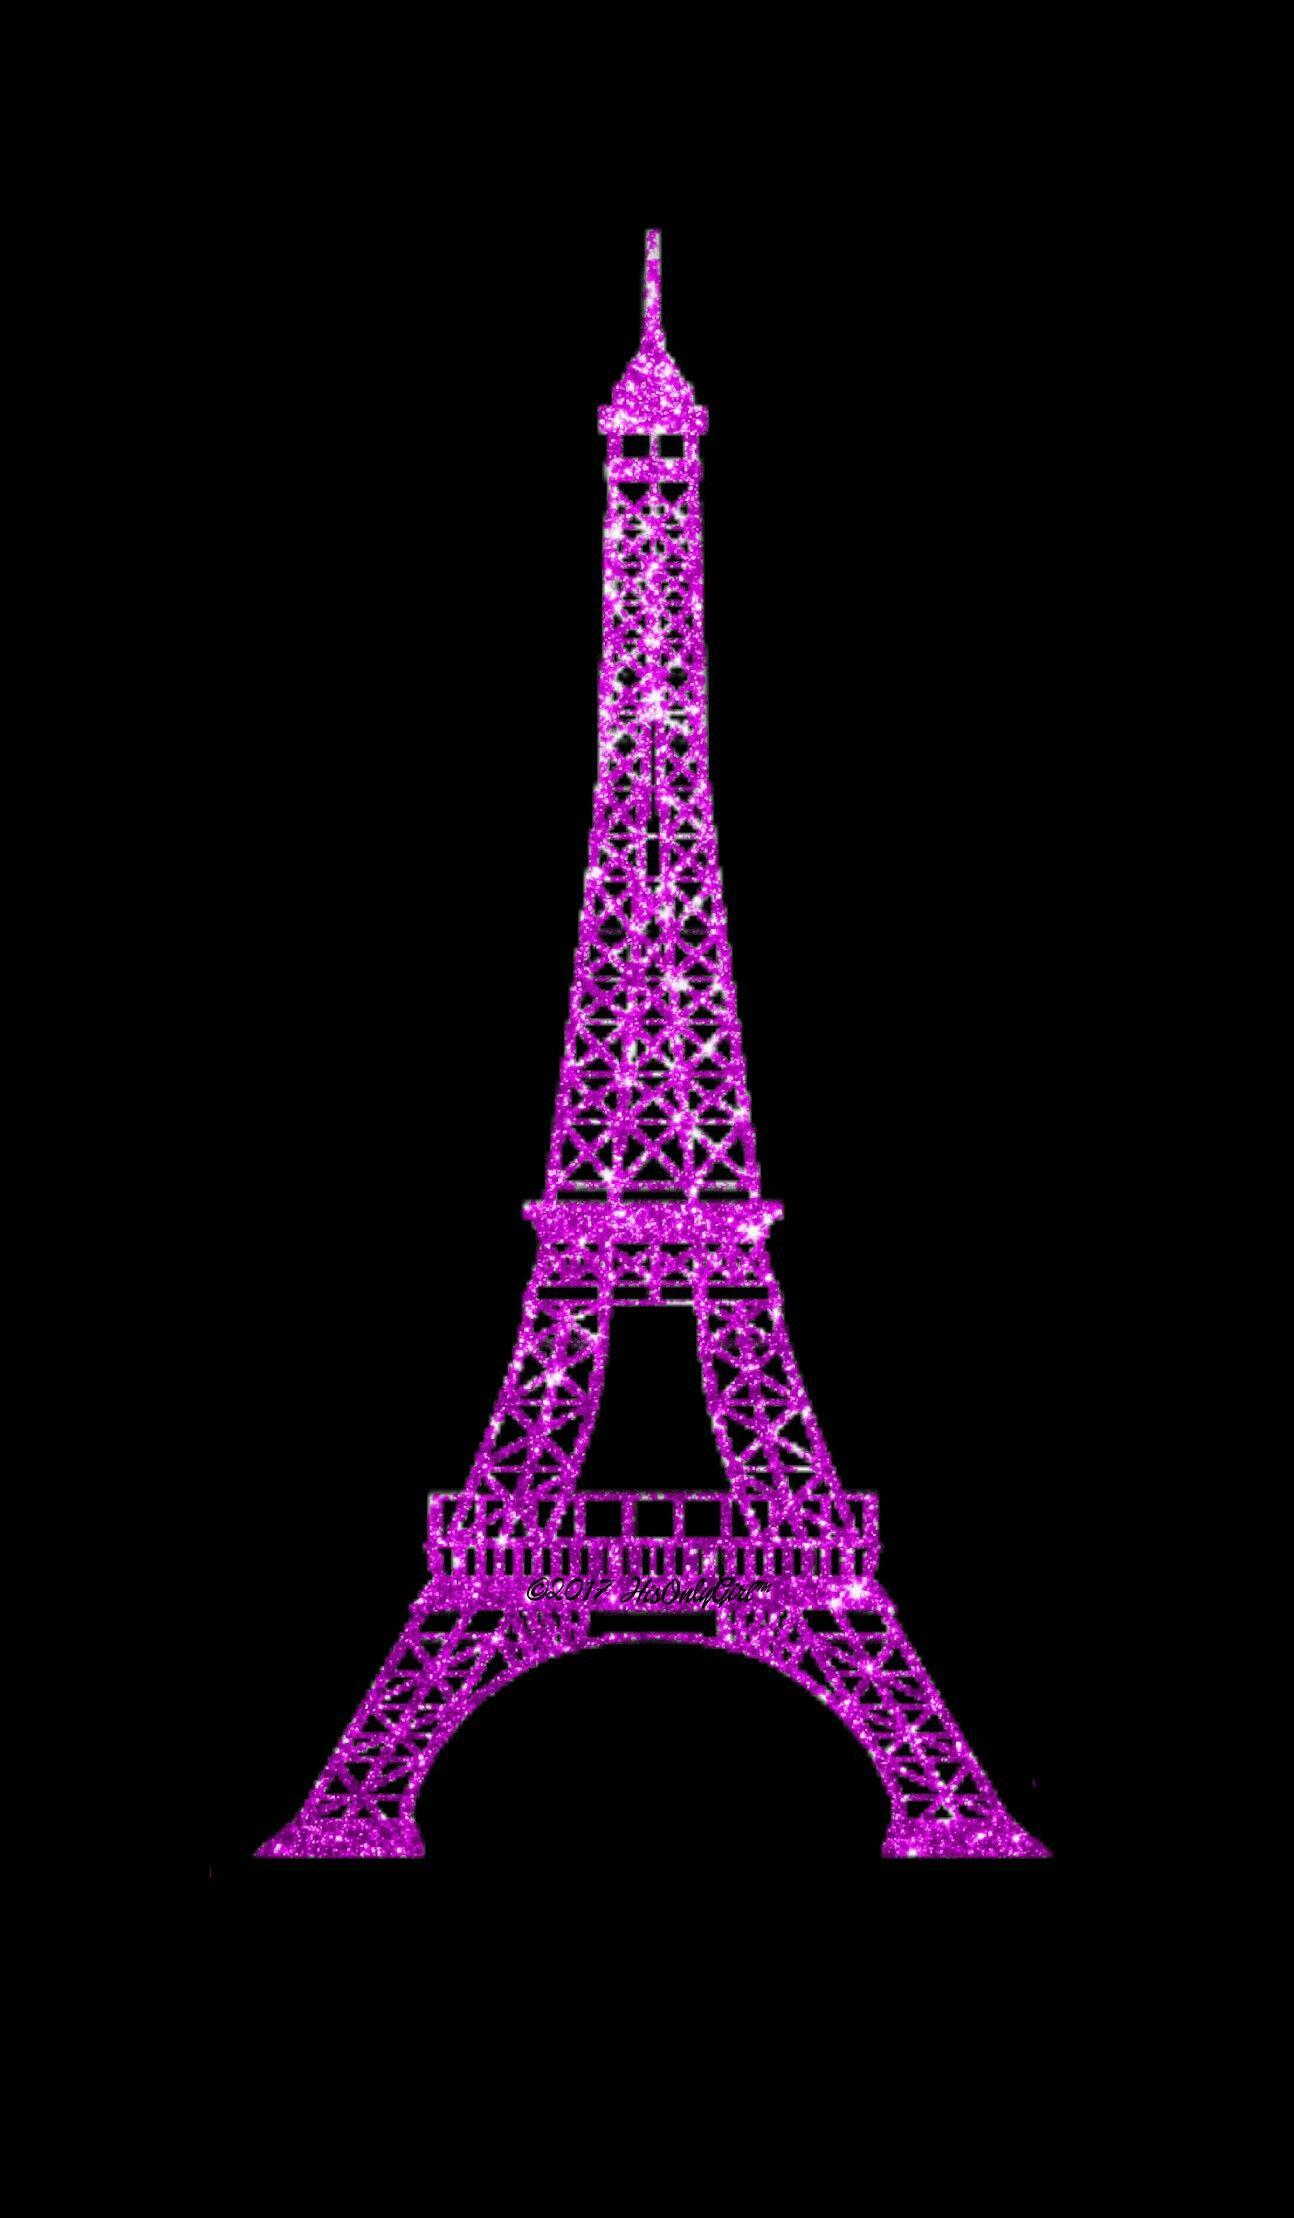 Eiffel Tower Glitter Wallpaper I Created For The App Cocoppa Paris Tour Eiffel Glitter Images Iphone Wallpaper Glitter